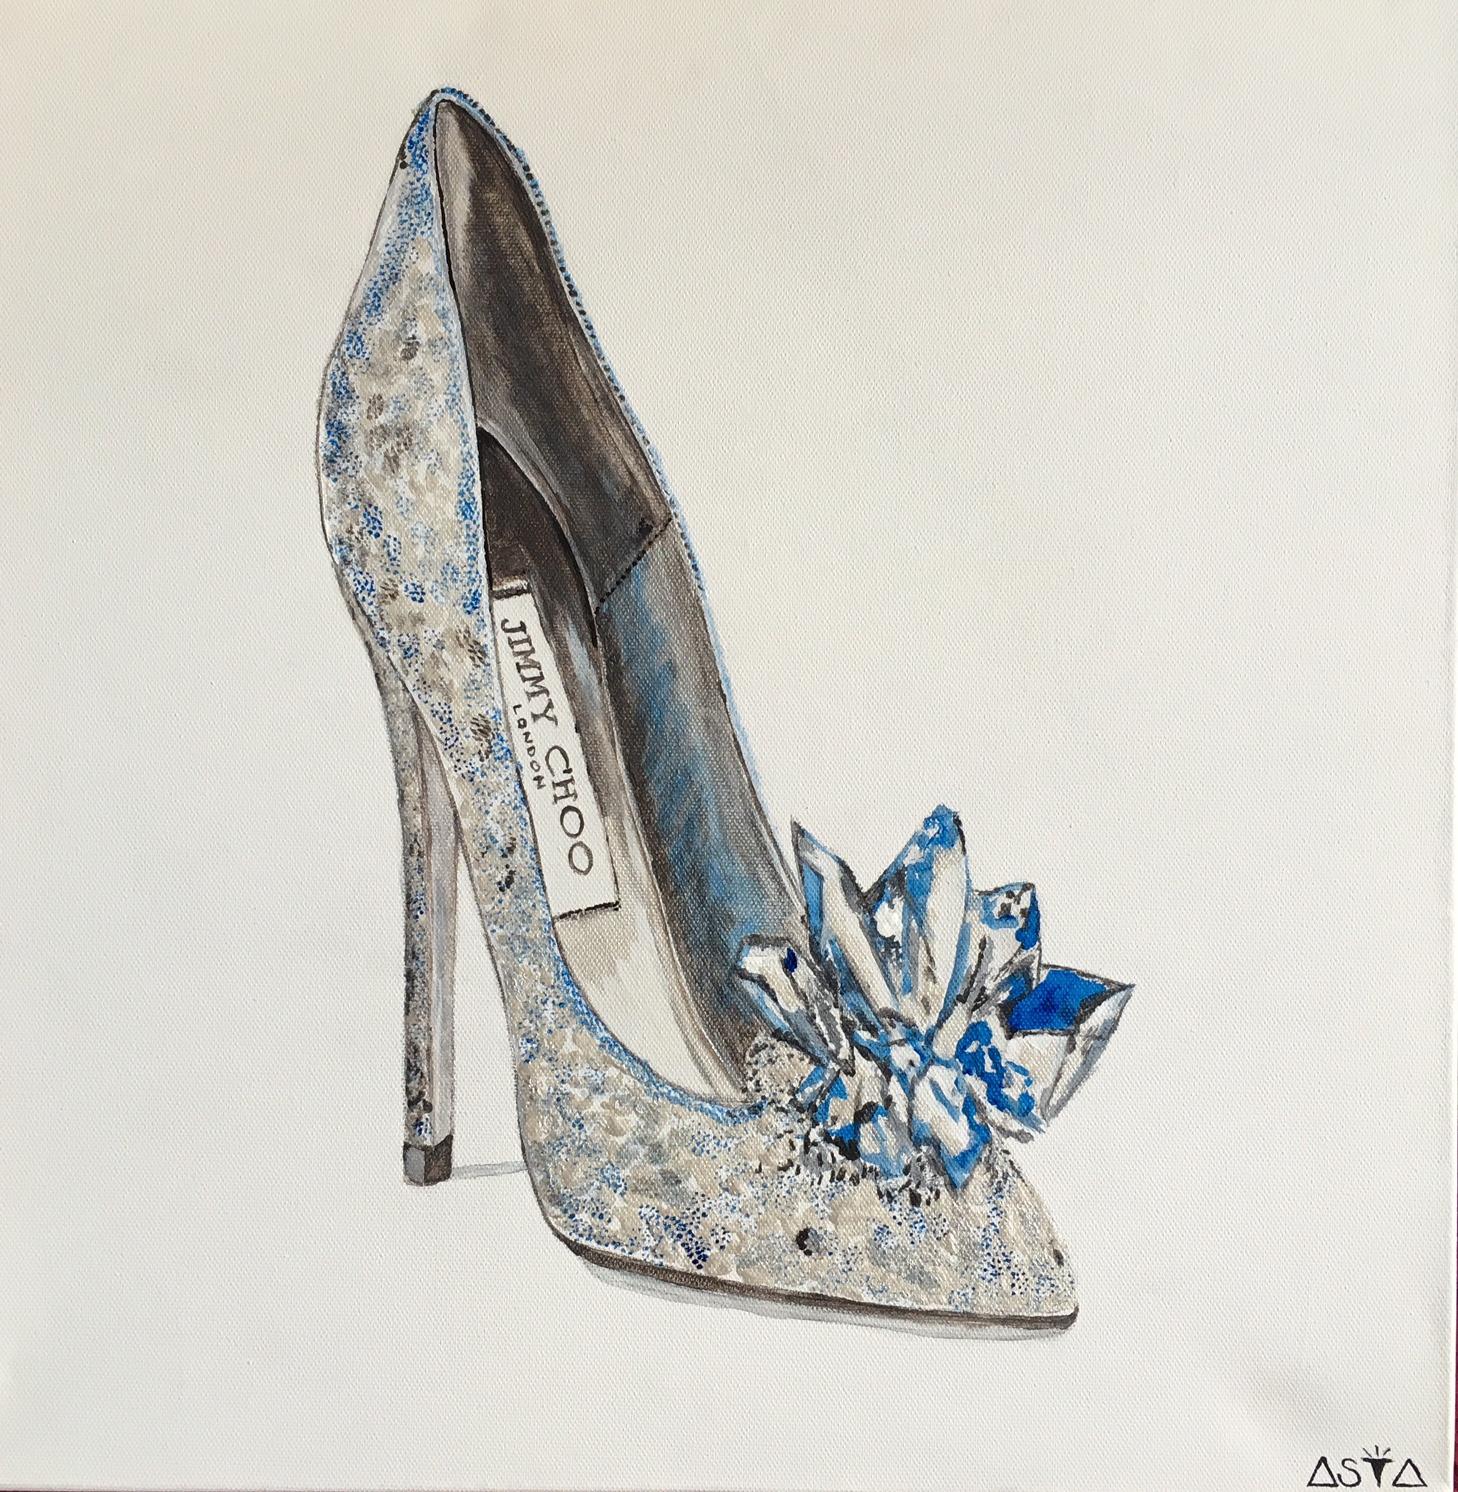 Louboutin / Jimmy Choo Art – Asta Razma